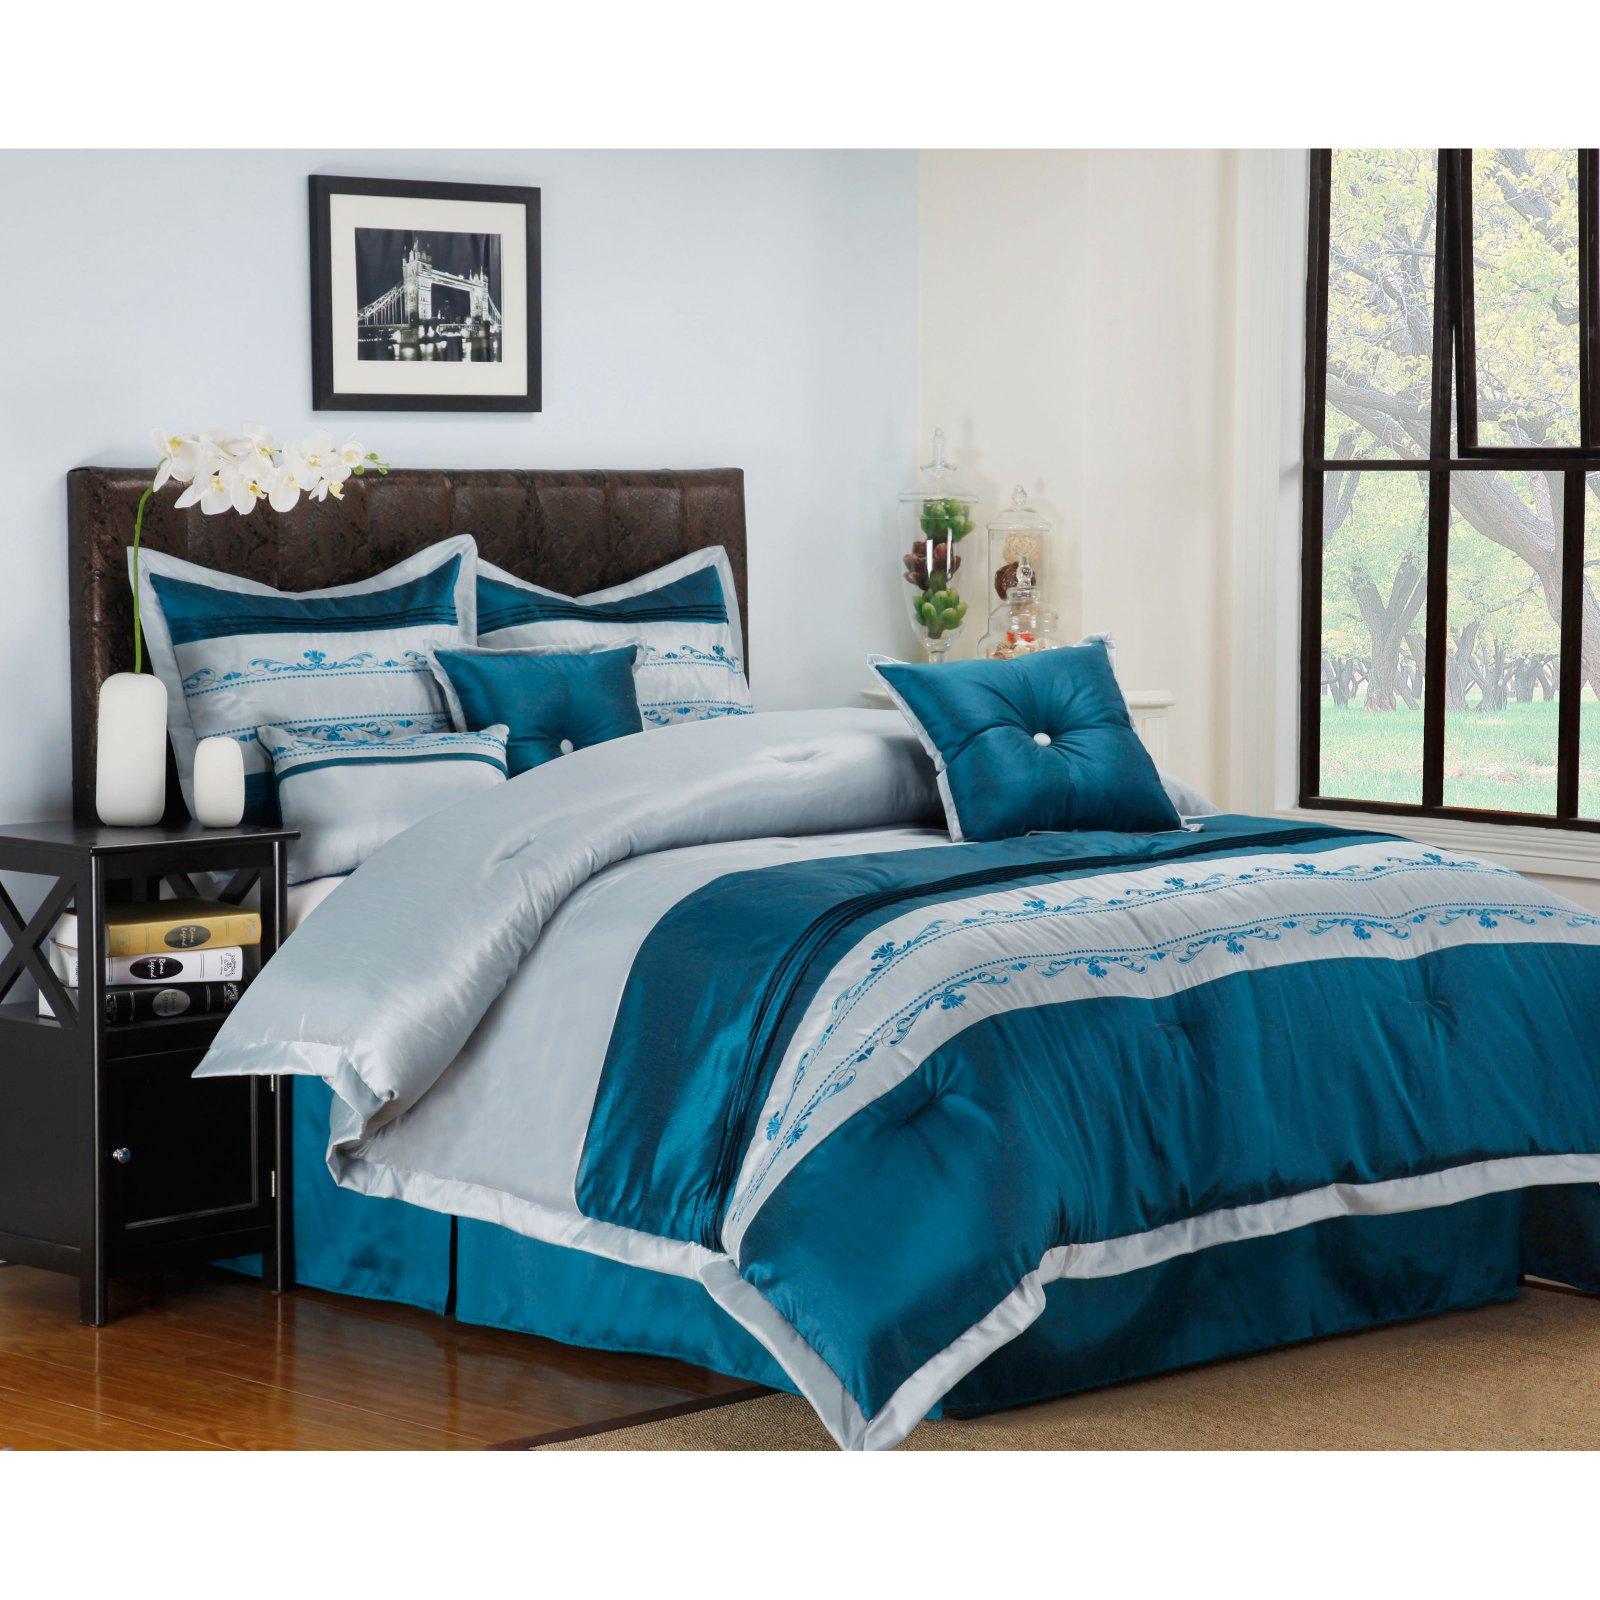 Superior Carrington 7 Piece Bedding Set